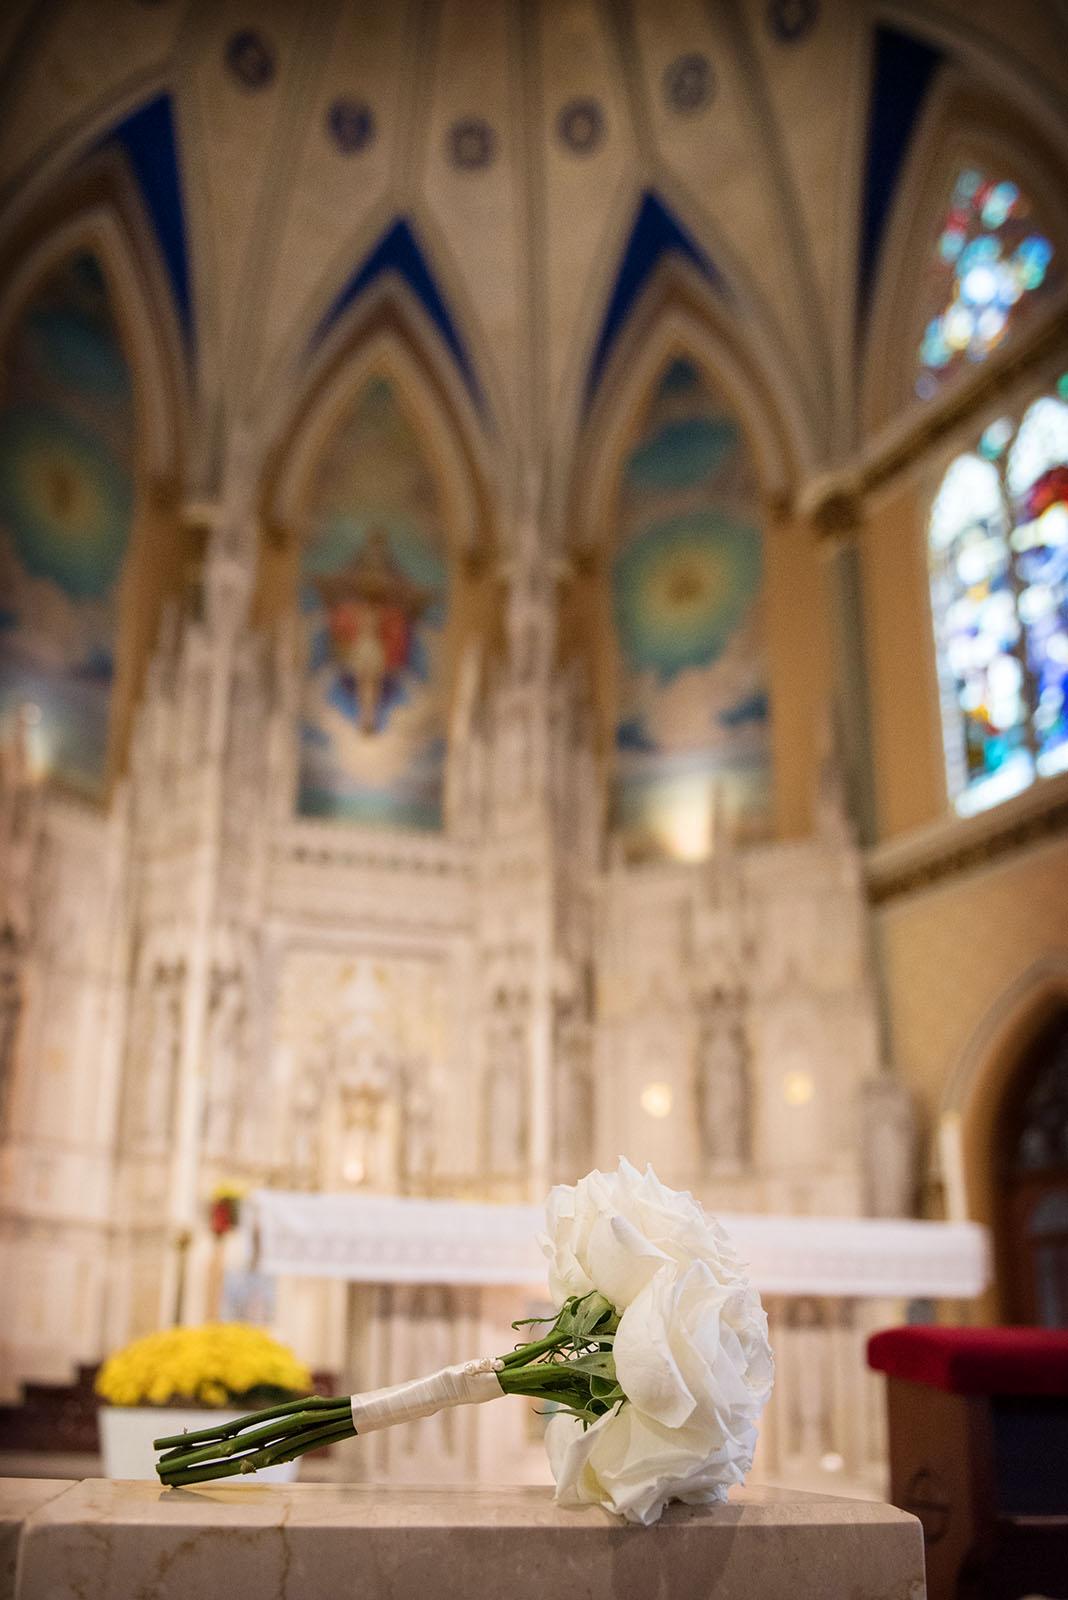 Flowers for Mary altar St Alphonsus Church